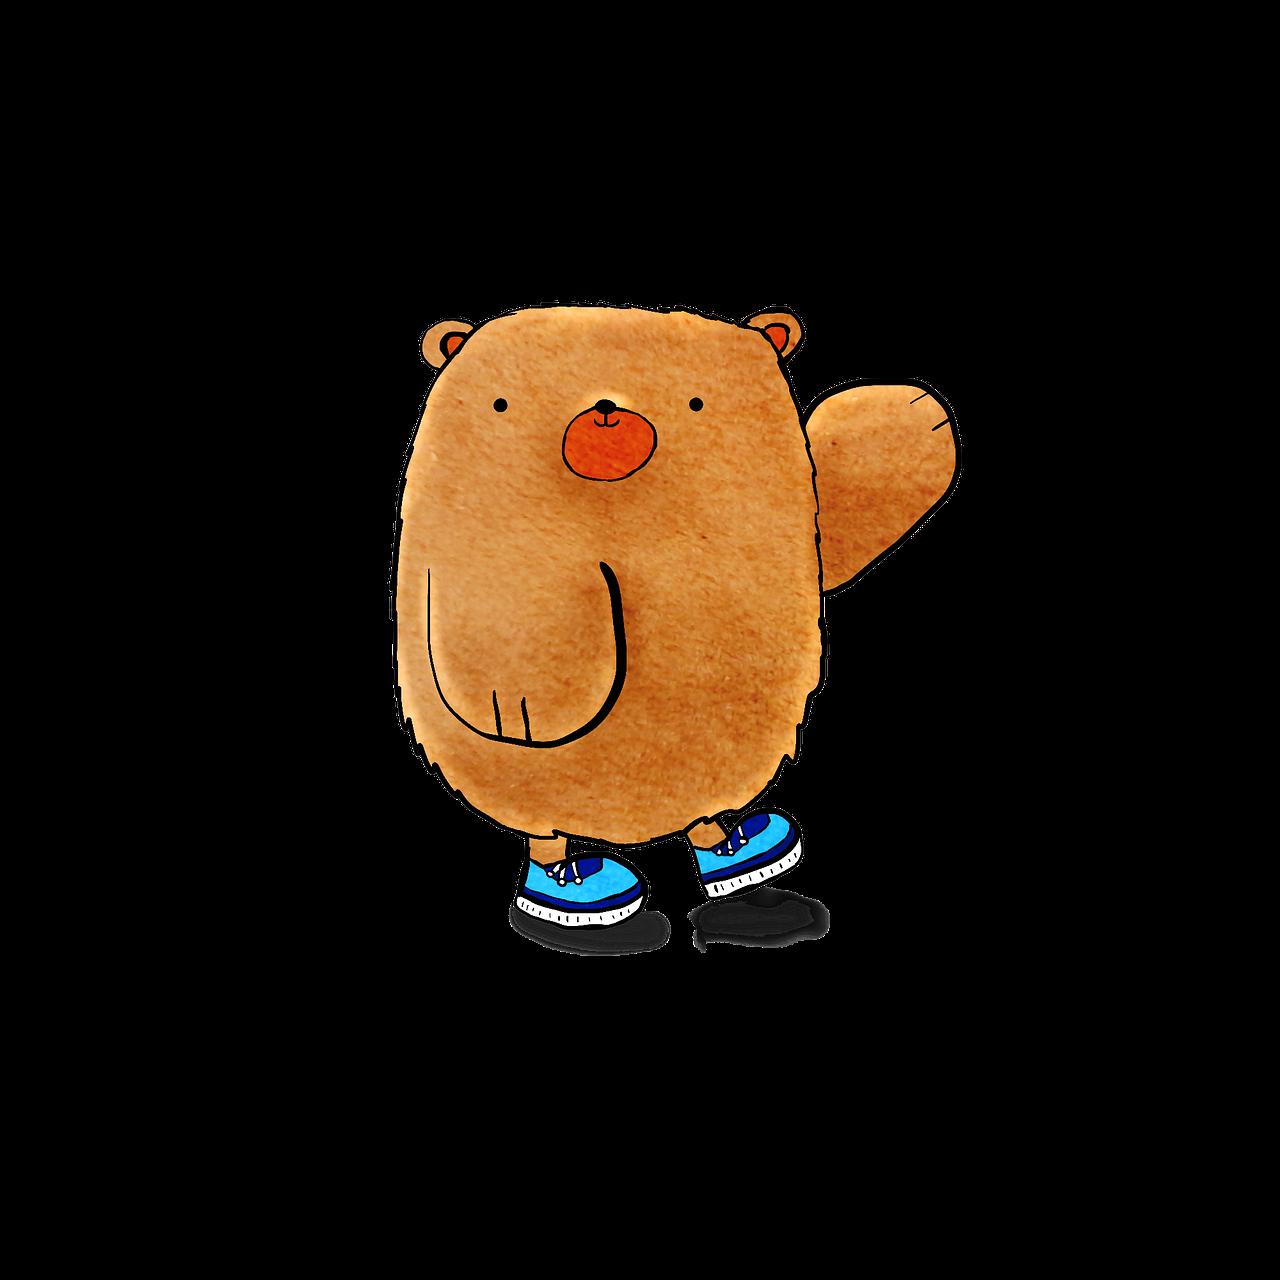 Bear Cute Cartoon Free Image On Pixabay